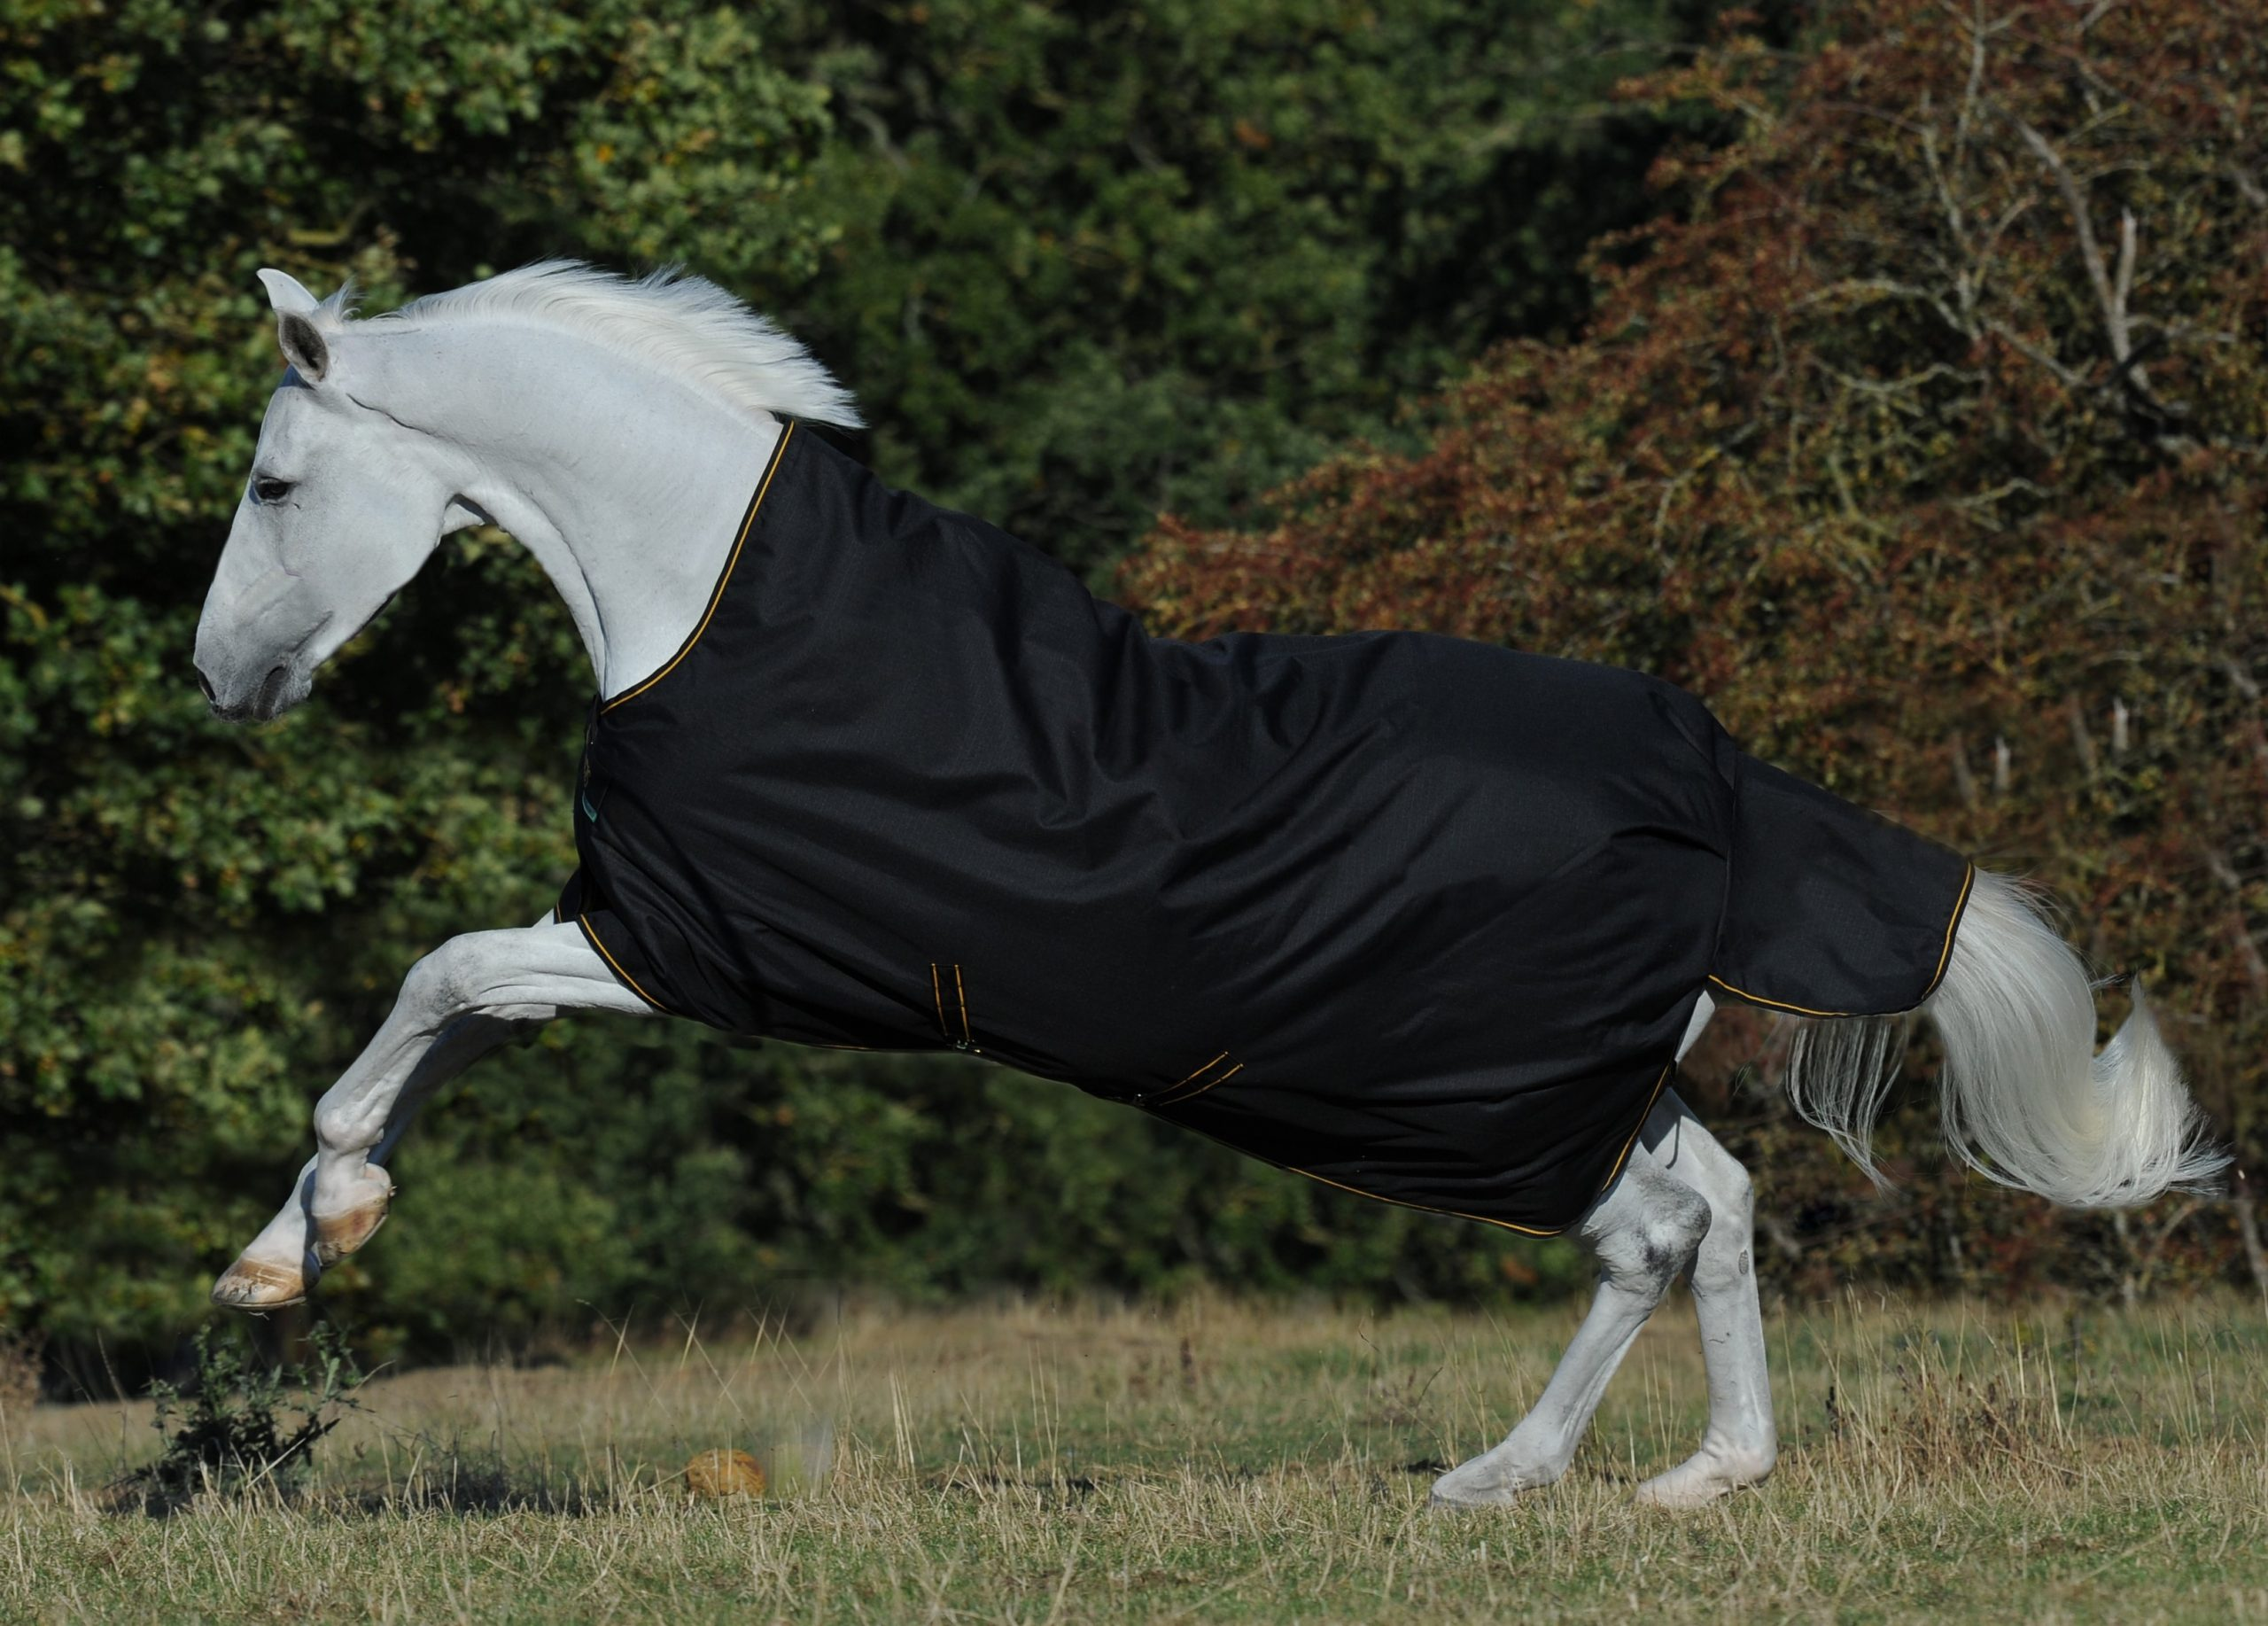 Bucas Irish Turnout Extra 300g Pony 1200d-Black//Gold